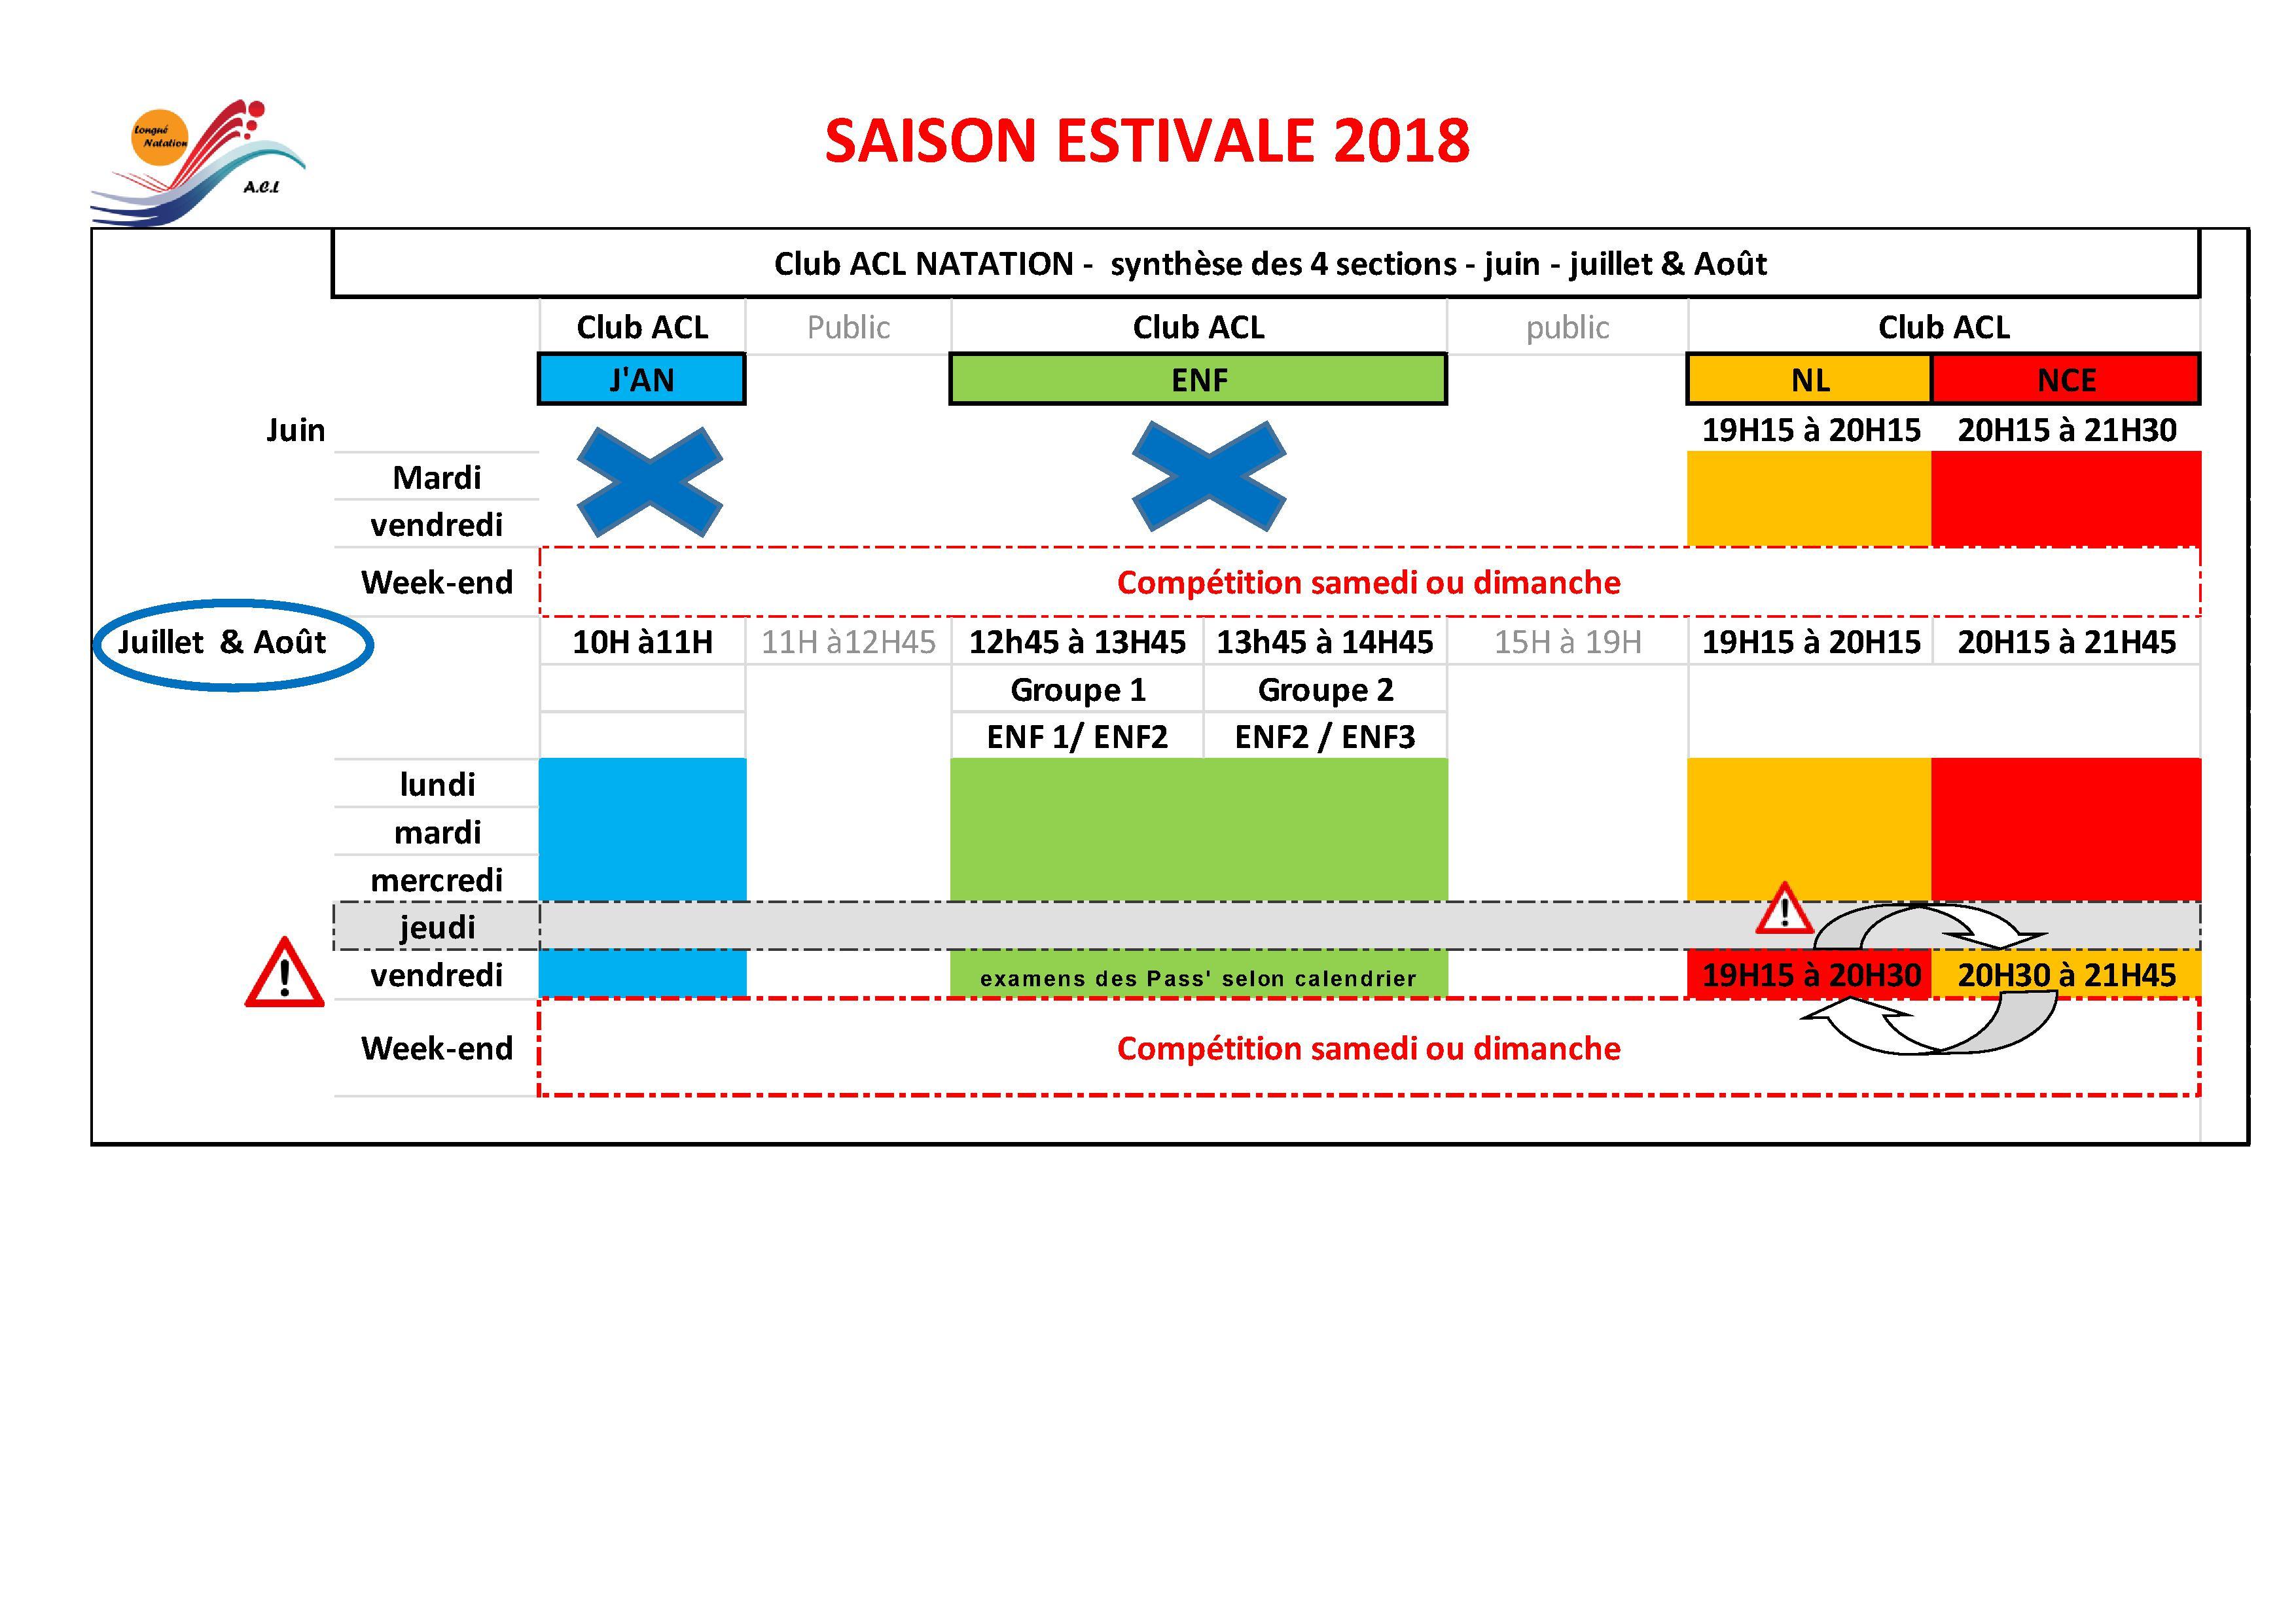 SAISON ESTIVALE 2018.jpg